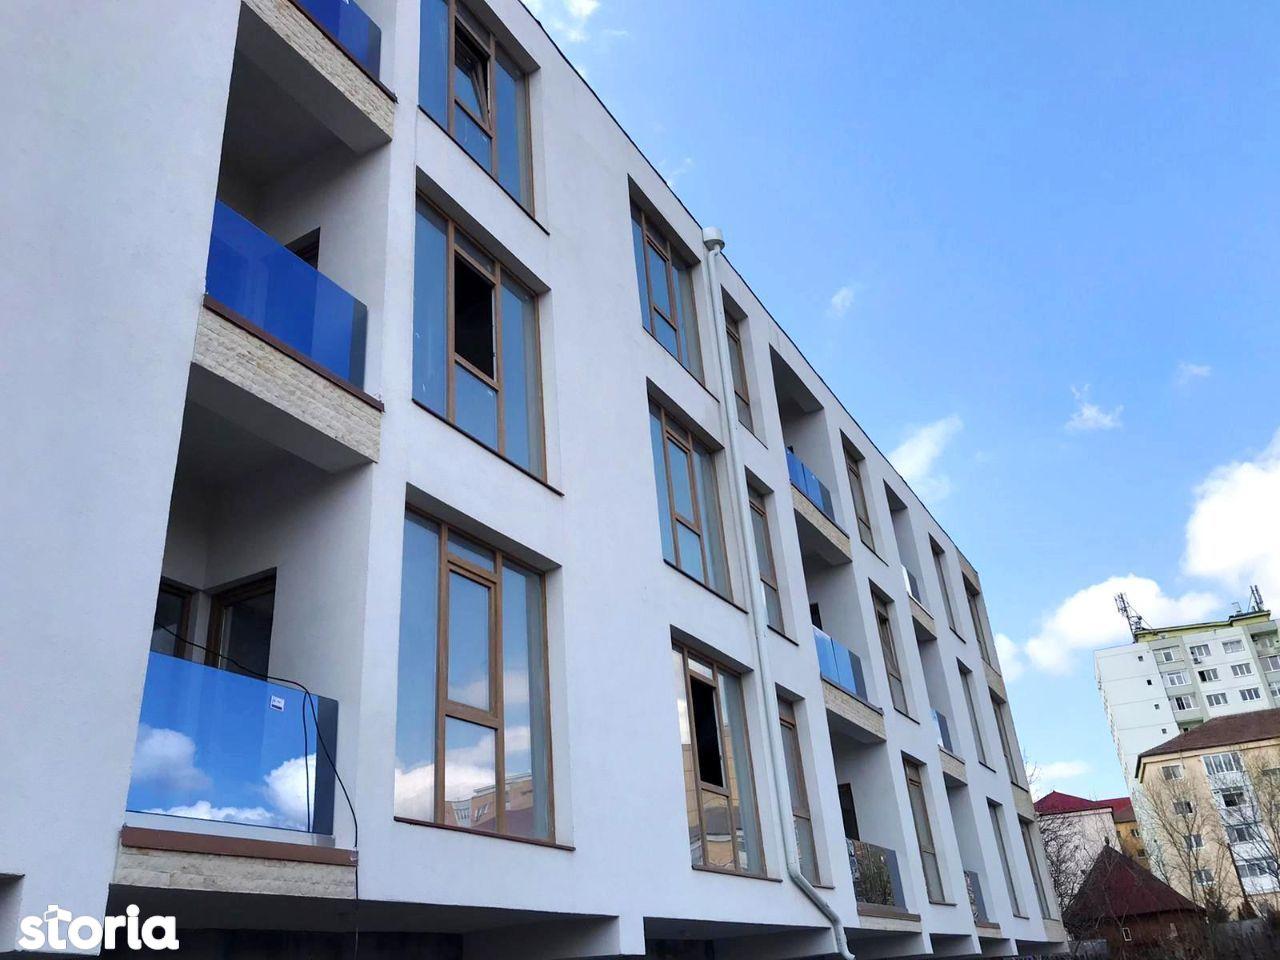 Apartament 2 camere+ parcare inclusa-50 000 euro Zona El Gringo, Mall